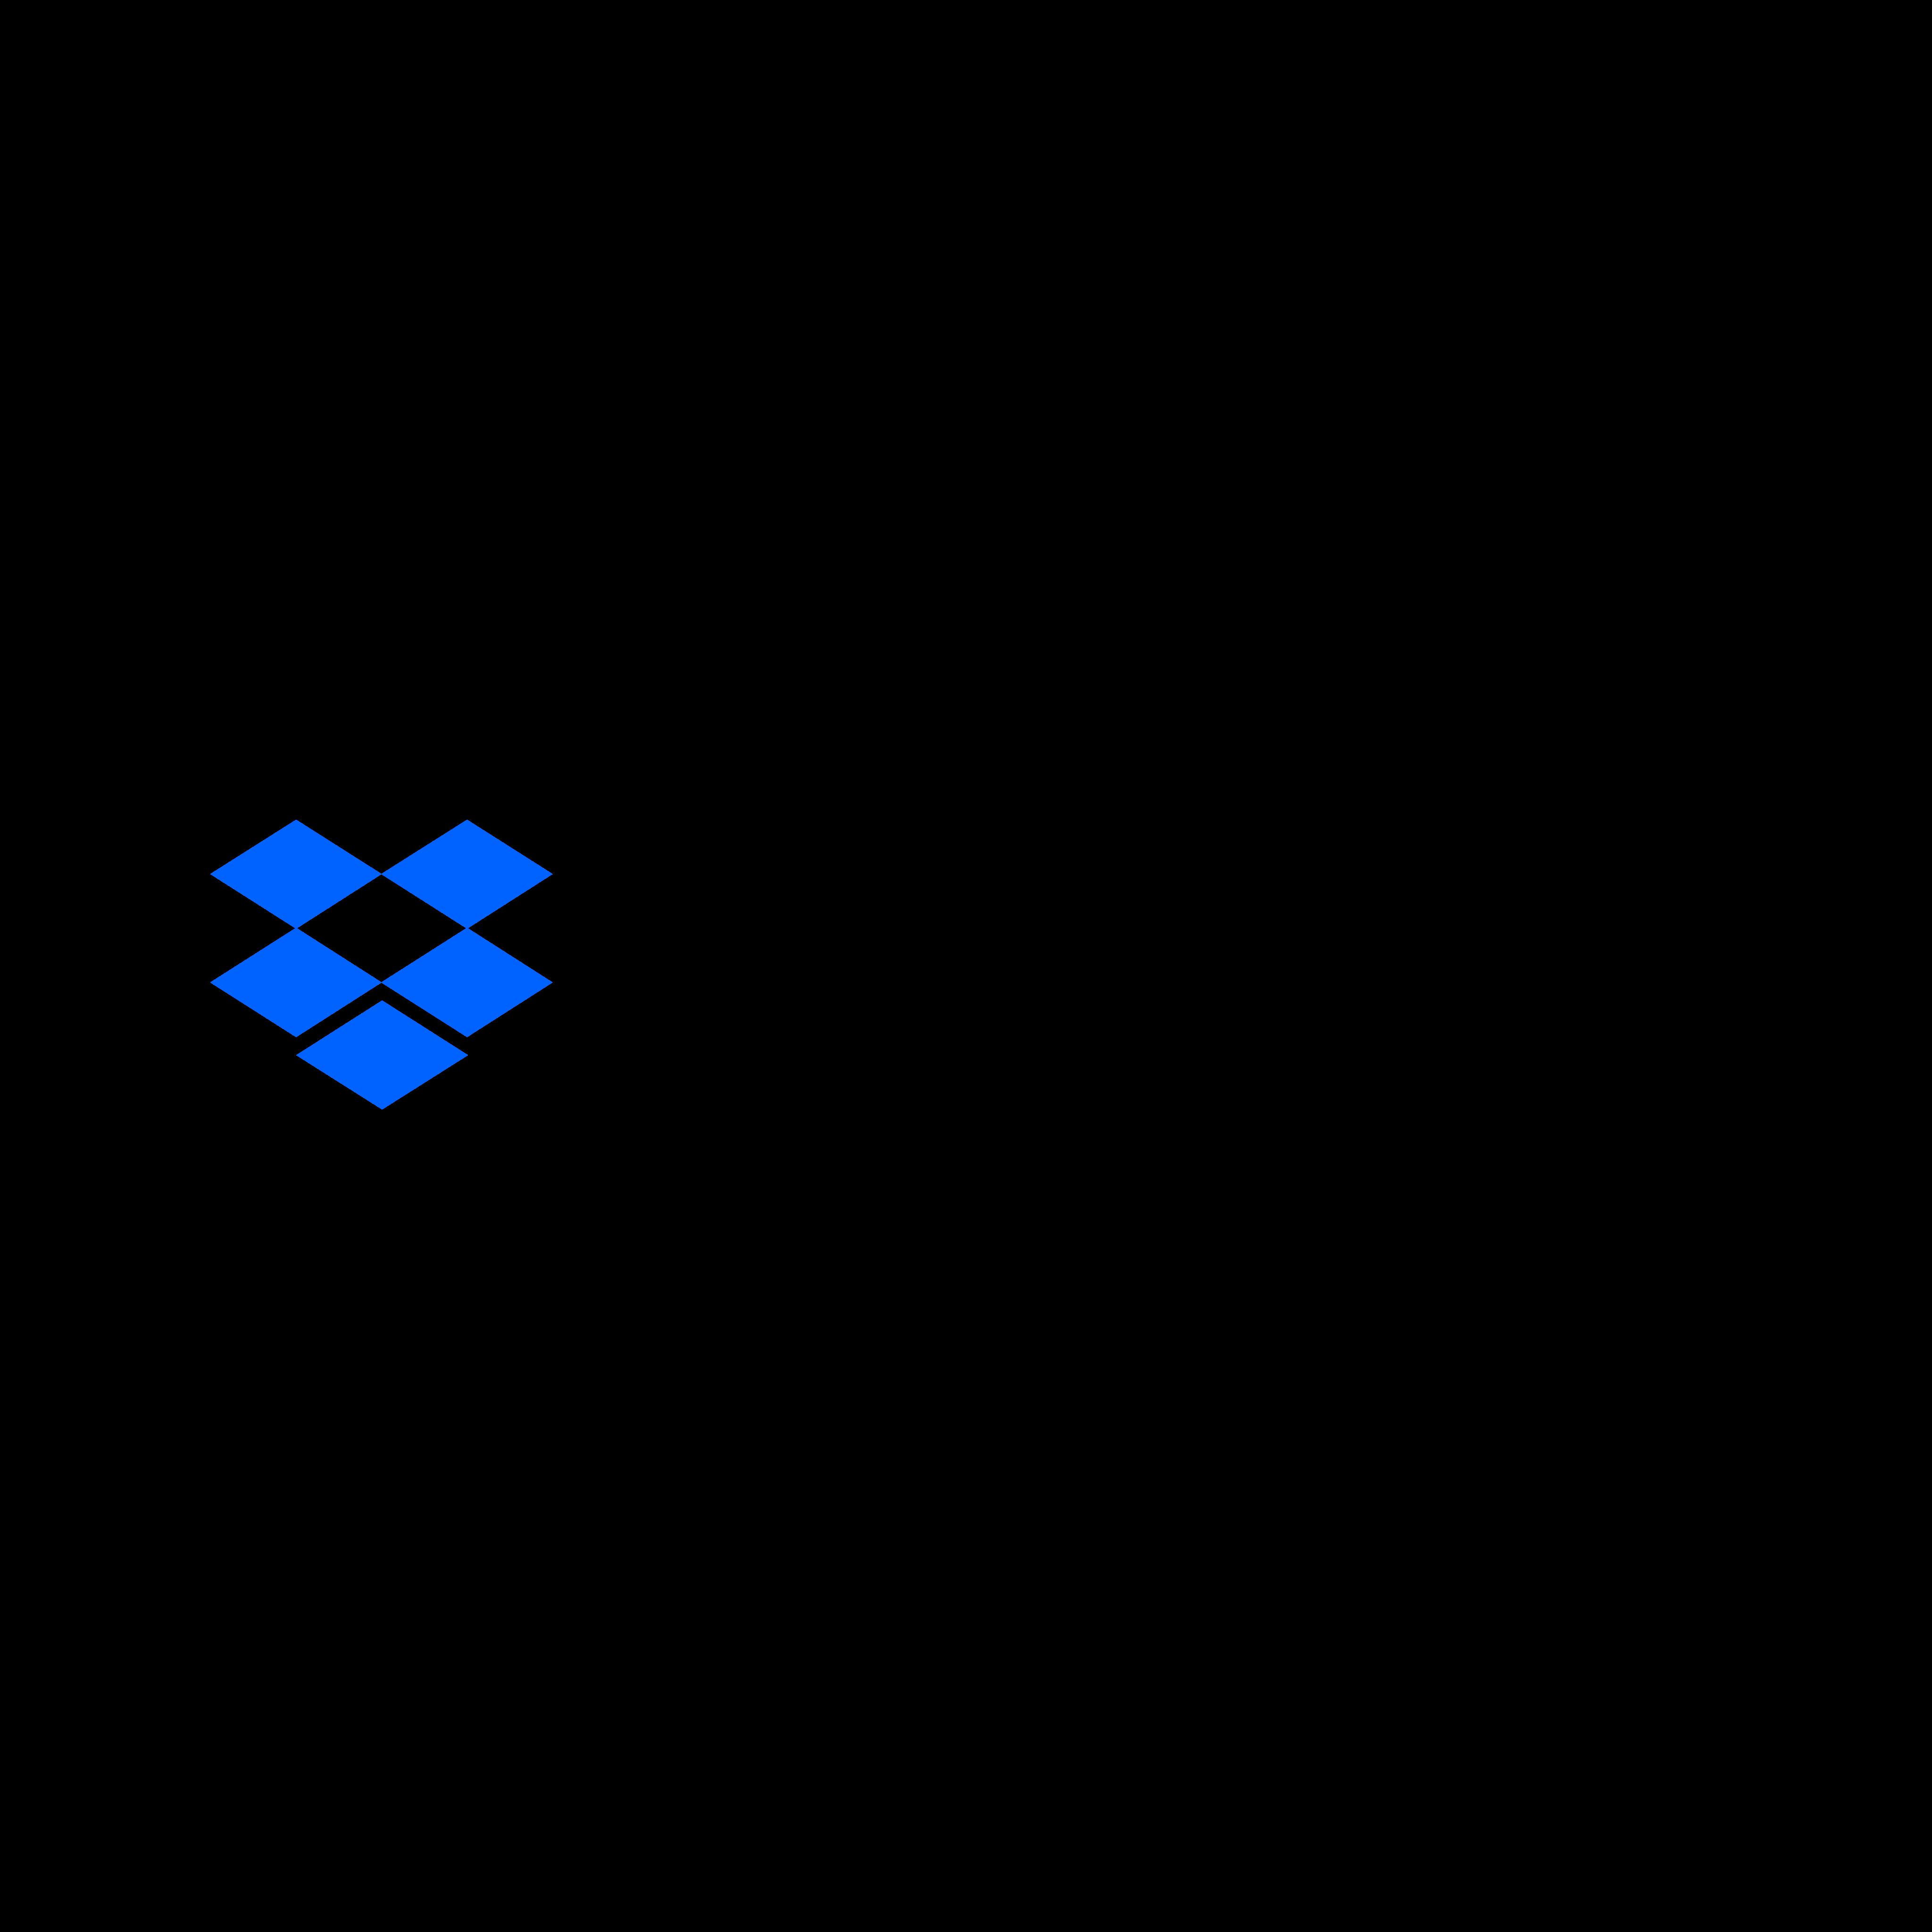 dropbox logo 0 - Dropbox Logo